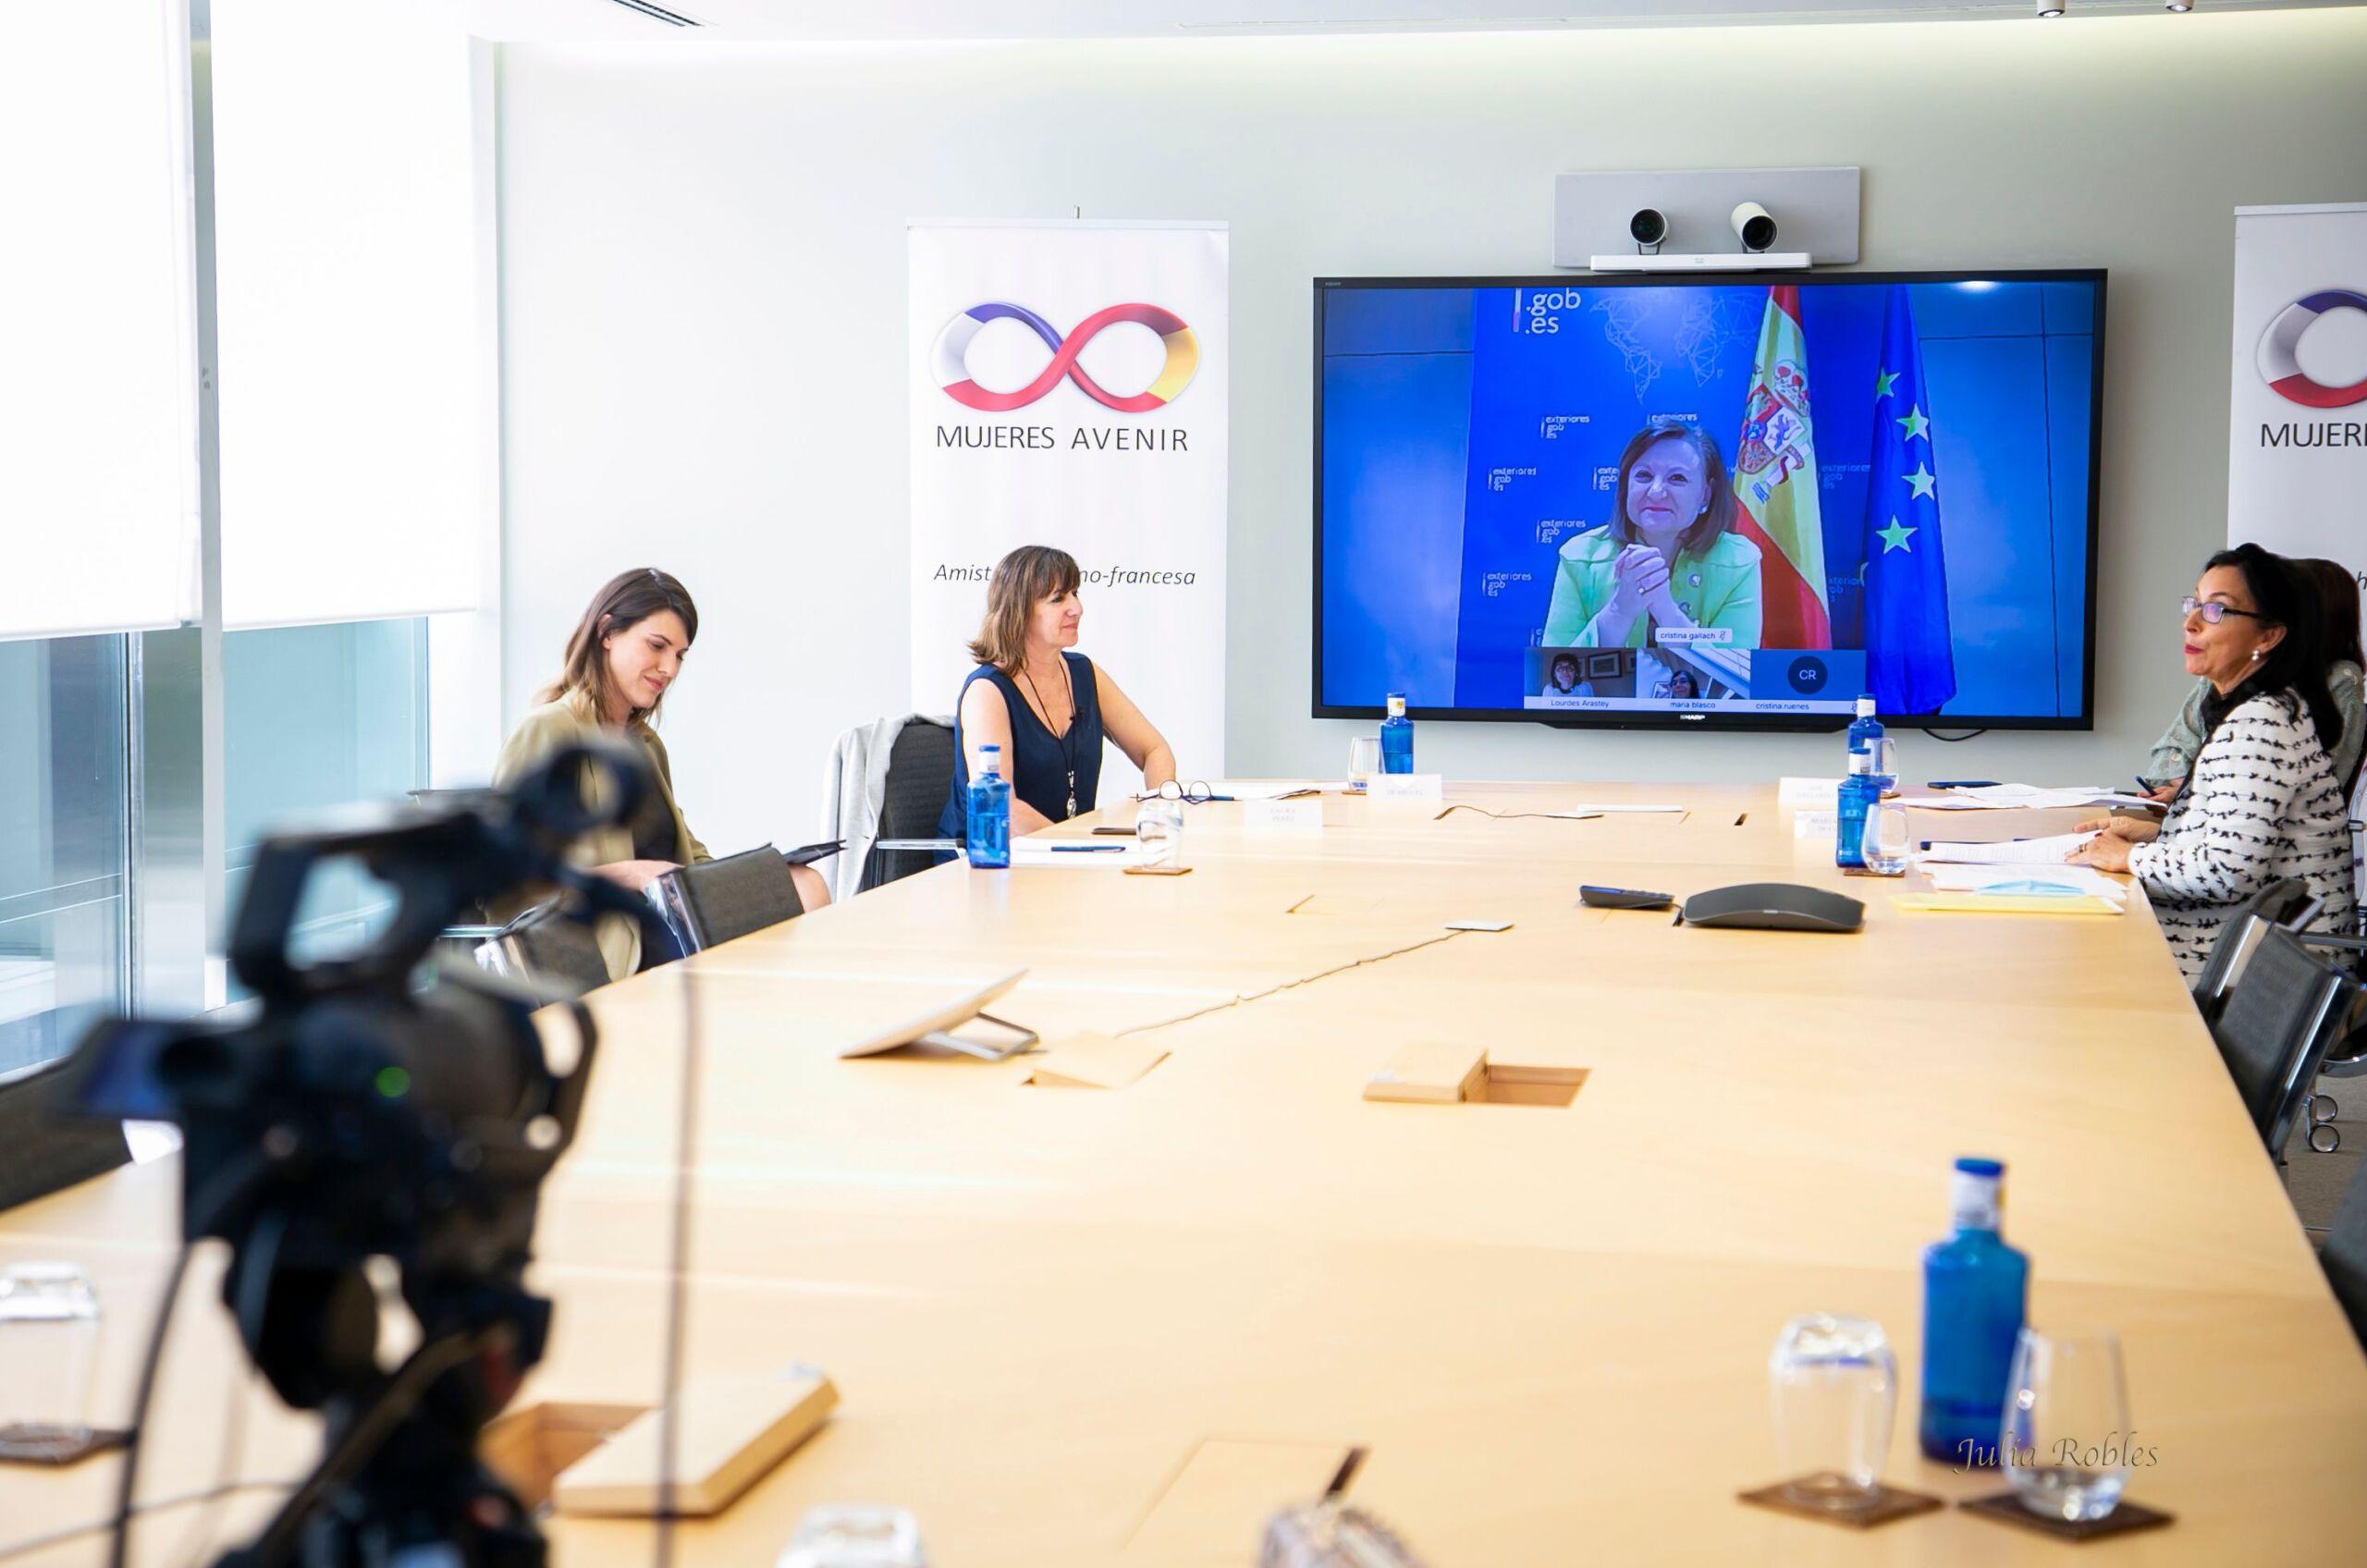 Evento Streaming Mujeres Avenir Salir de la Crisis Pandemia